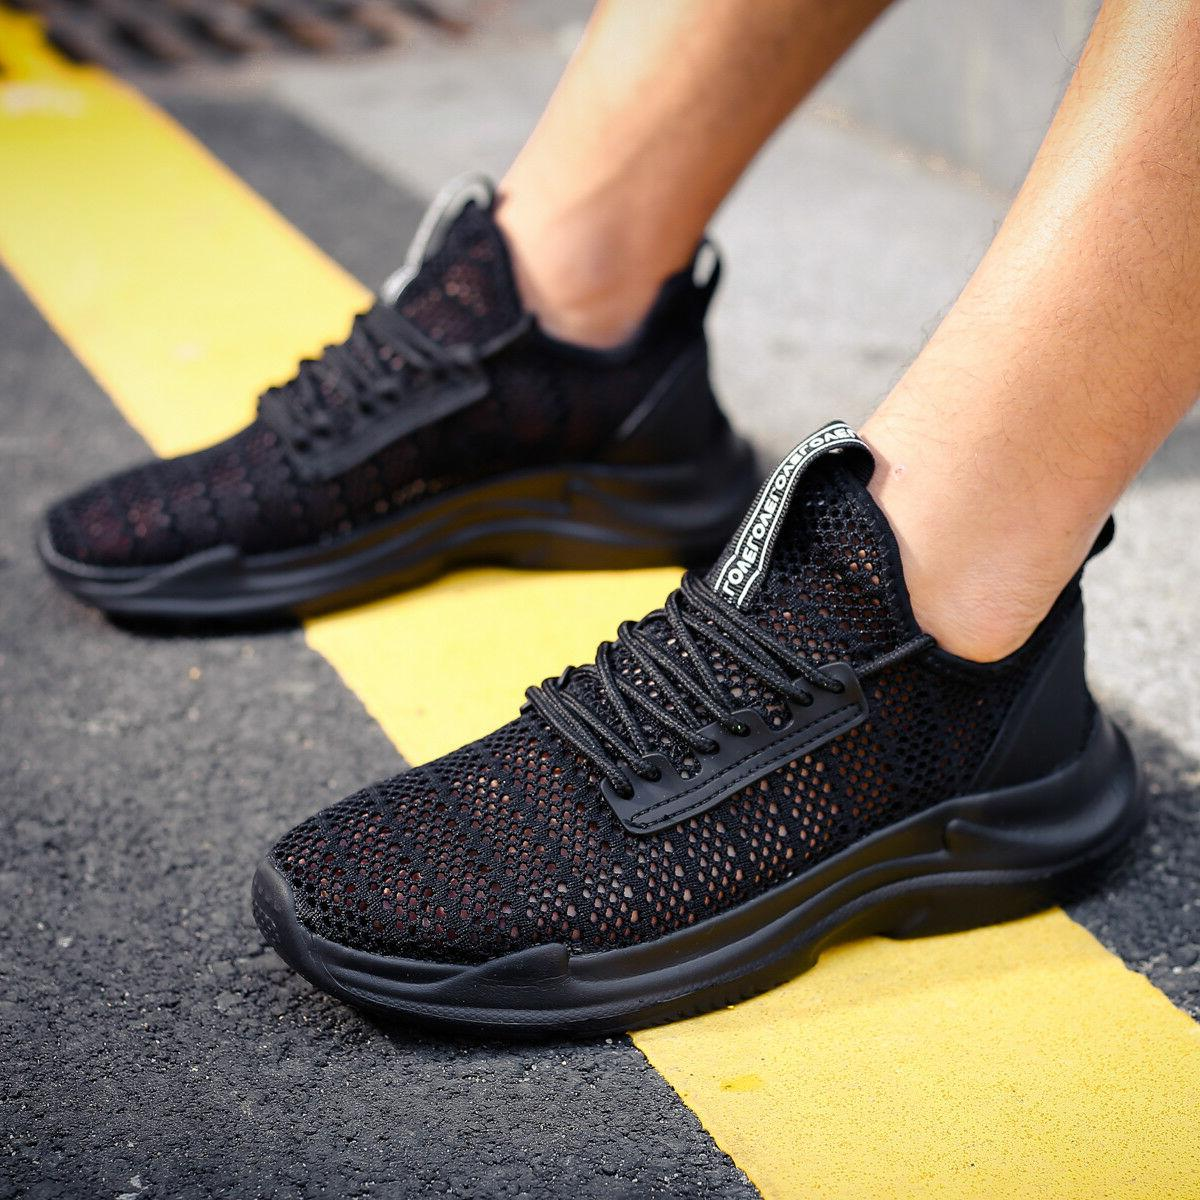 Puls size Men's Lightweight Aqua Water Shoes Beach Sneakers